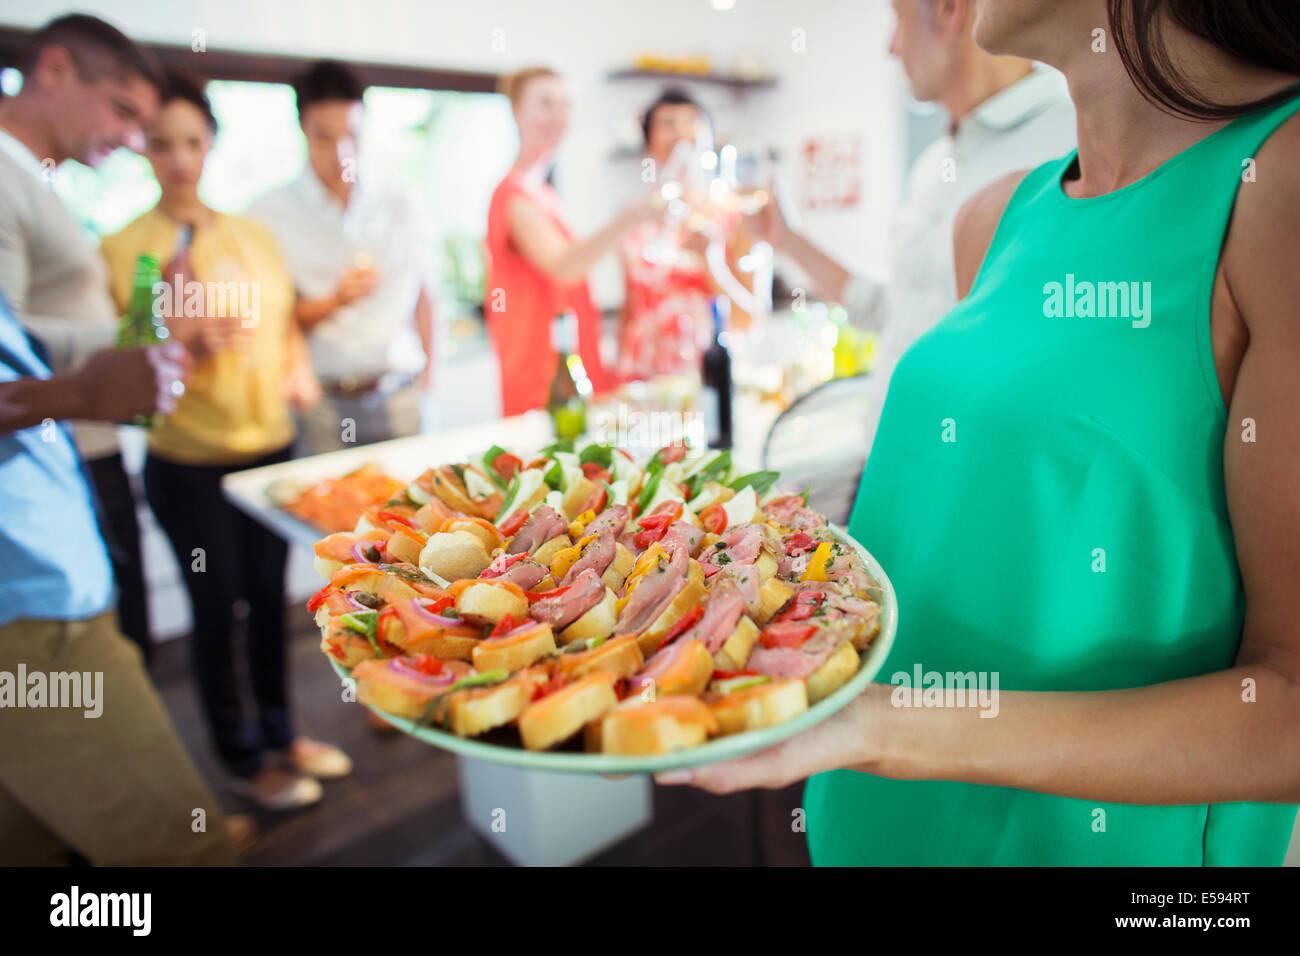 Frau Serviertablett von Lebensmitteln auf party Stockbild